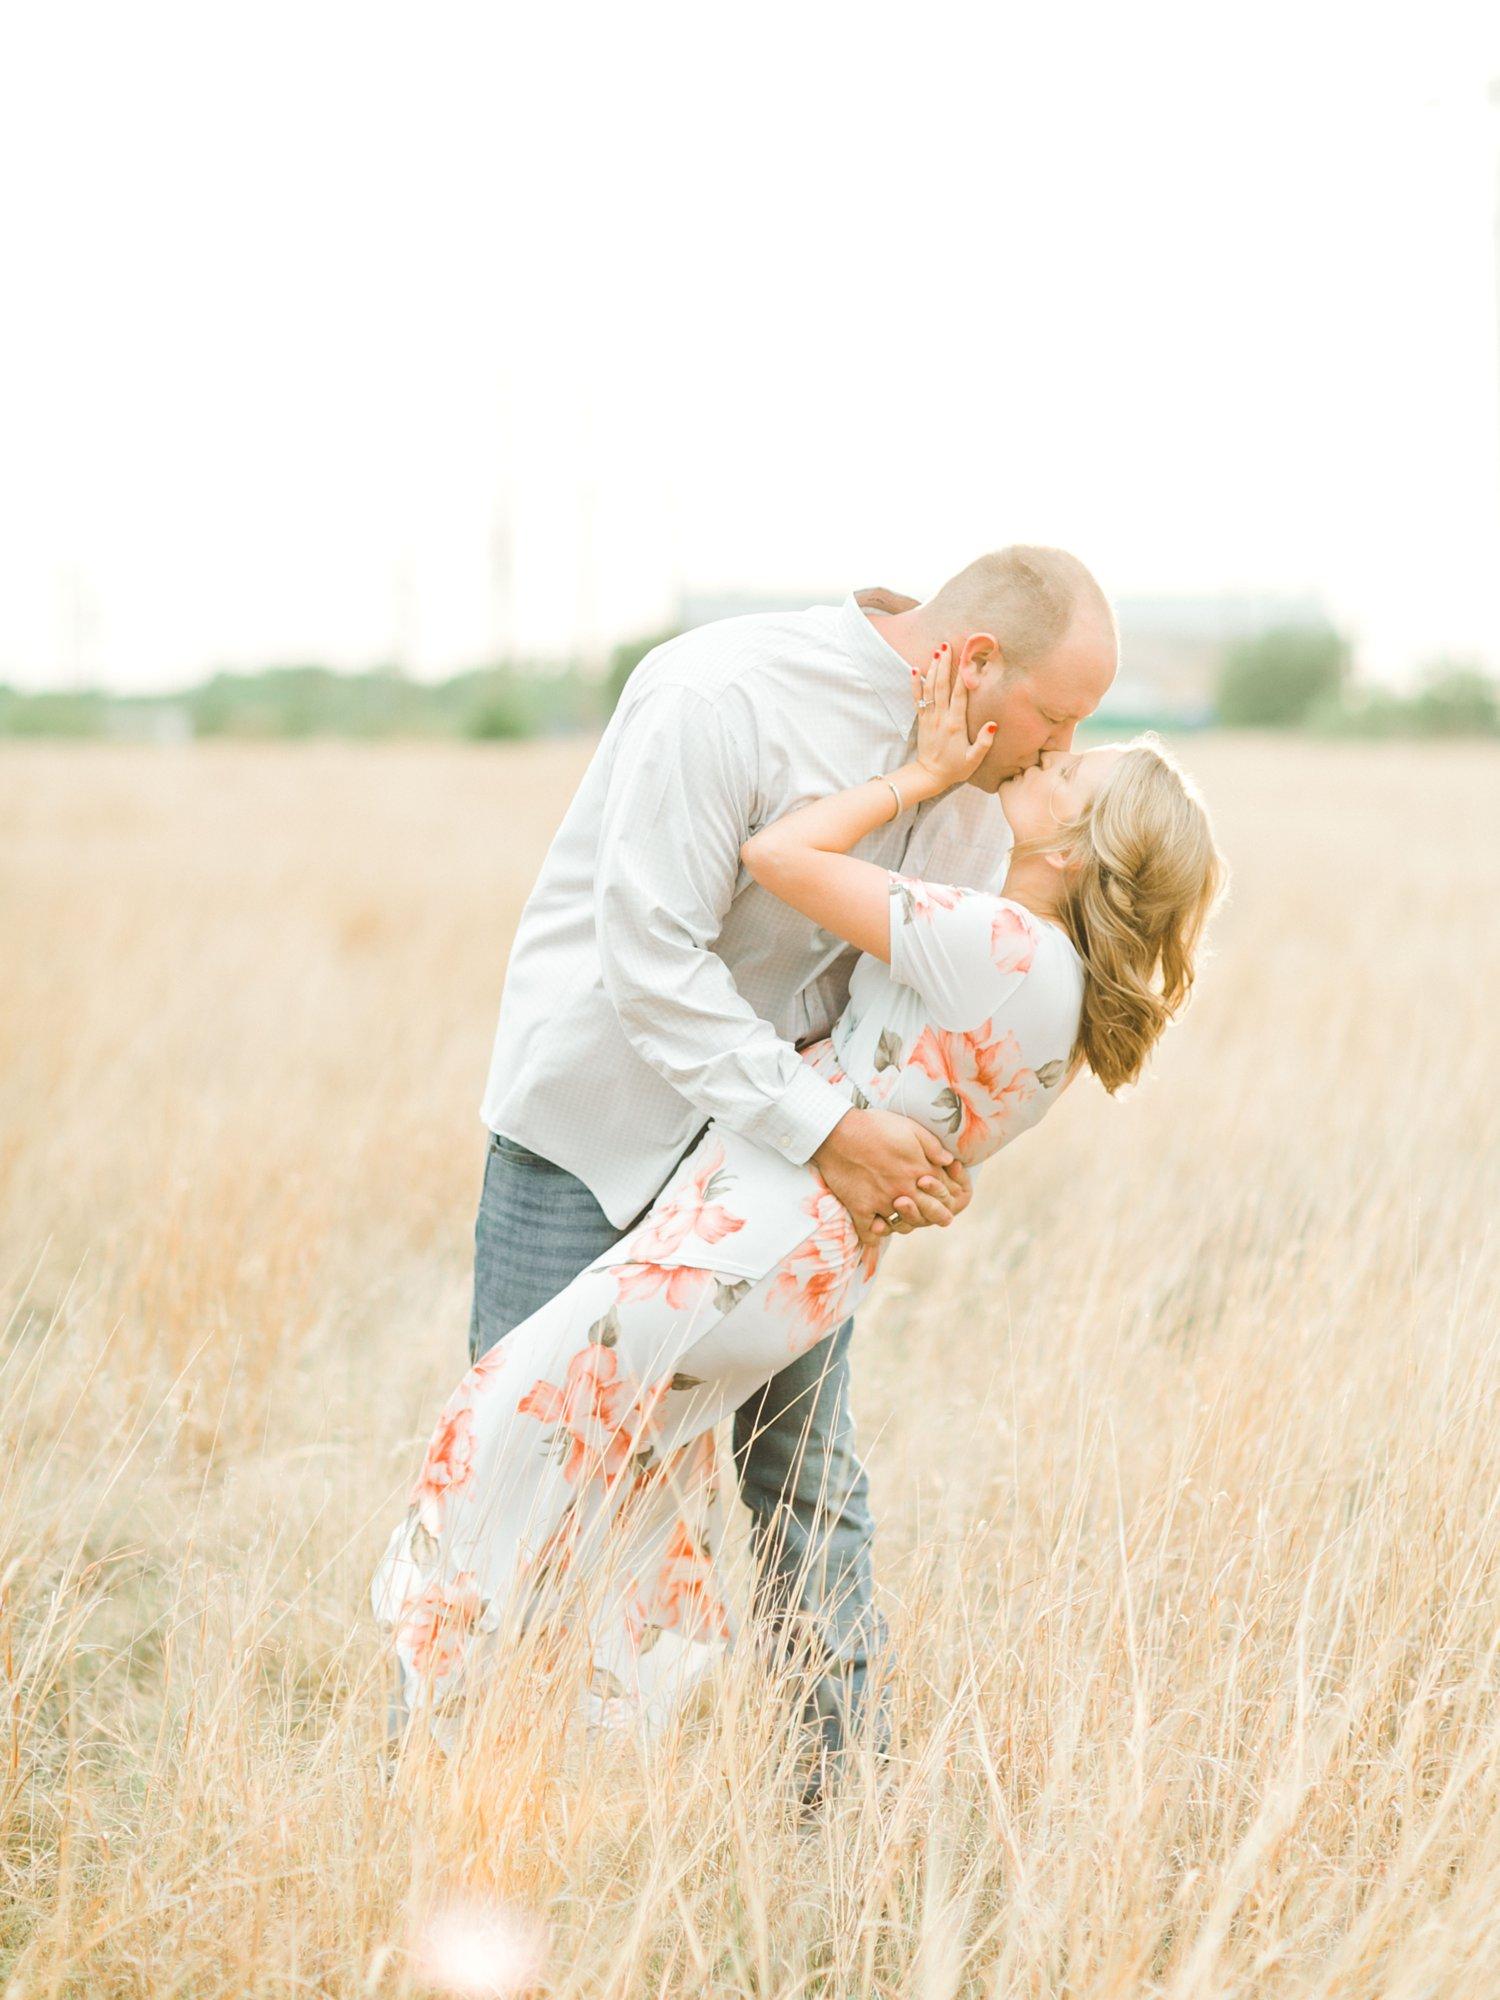 Morgan_and_Chris_Hebert_ALLEEJ_Engagement_Photographer_Lubbock_0031.jpg